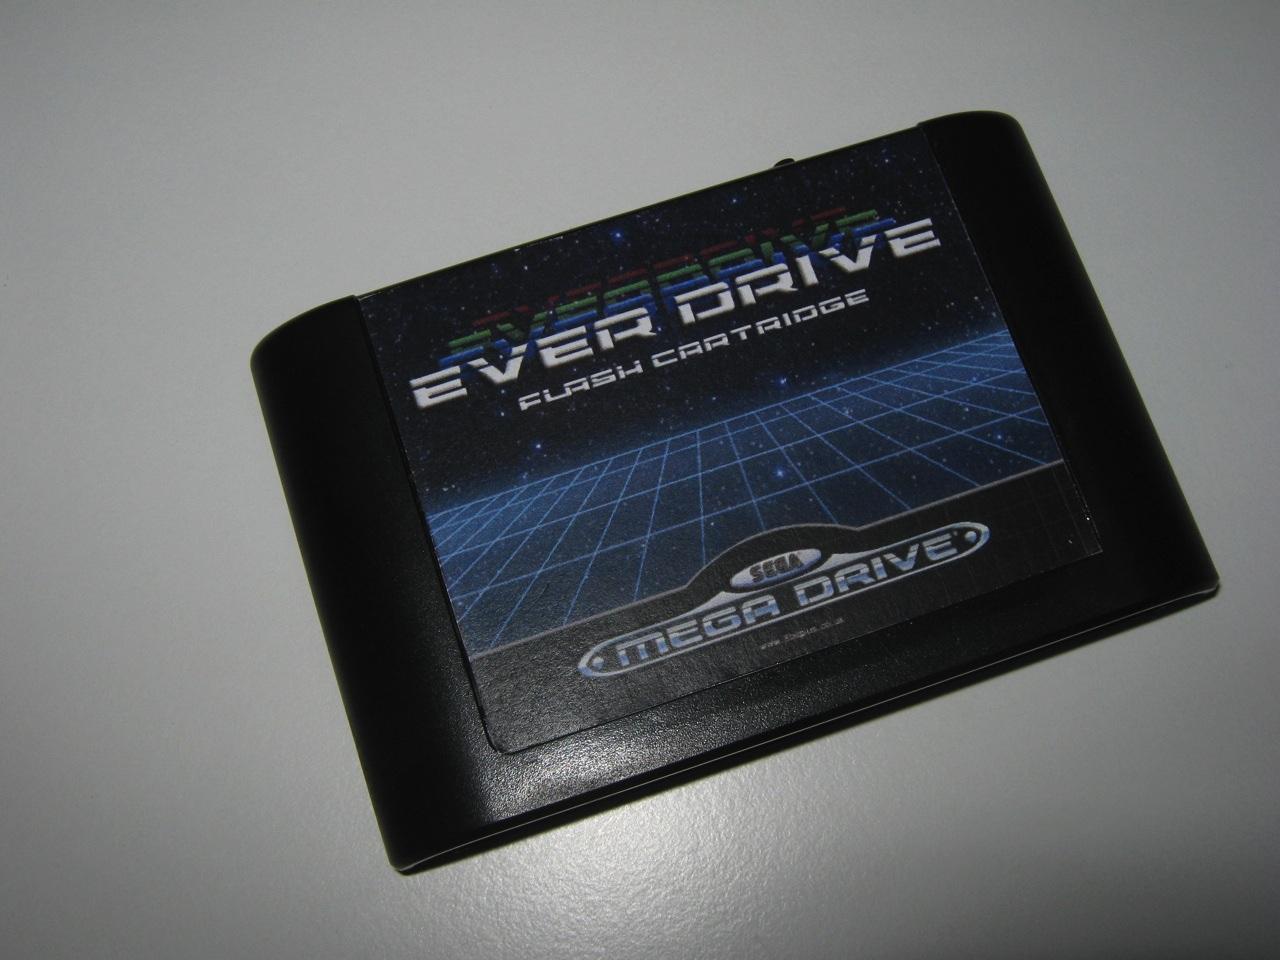 Everdrive | nIGHTFALL Blog / RetroComputerMania com